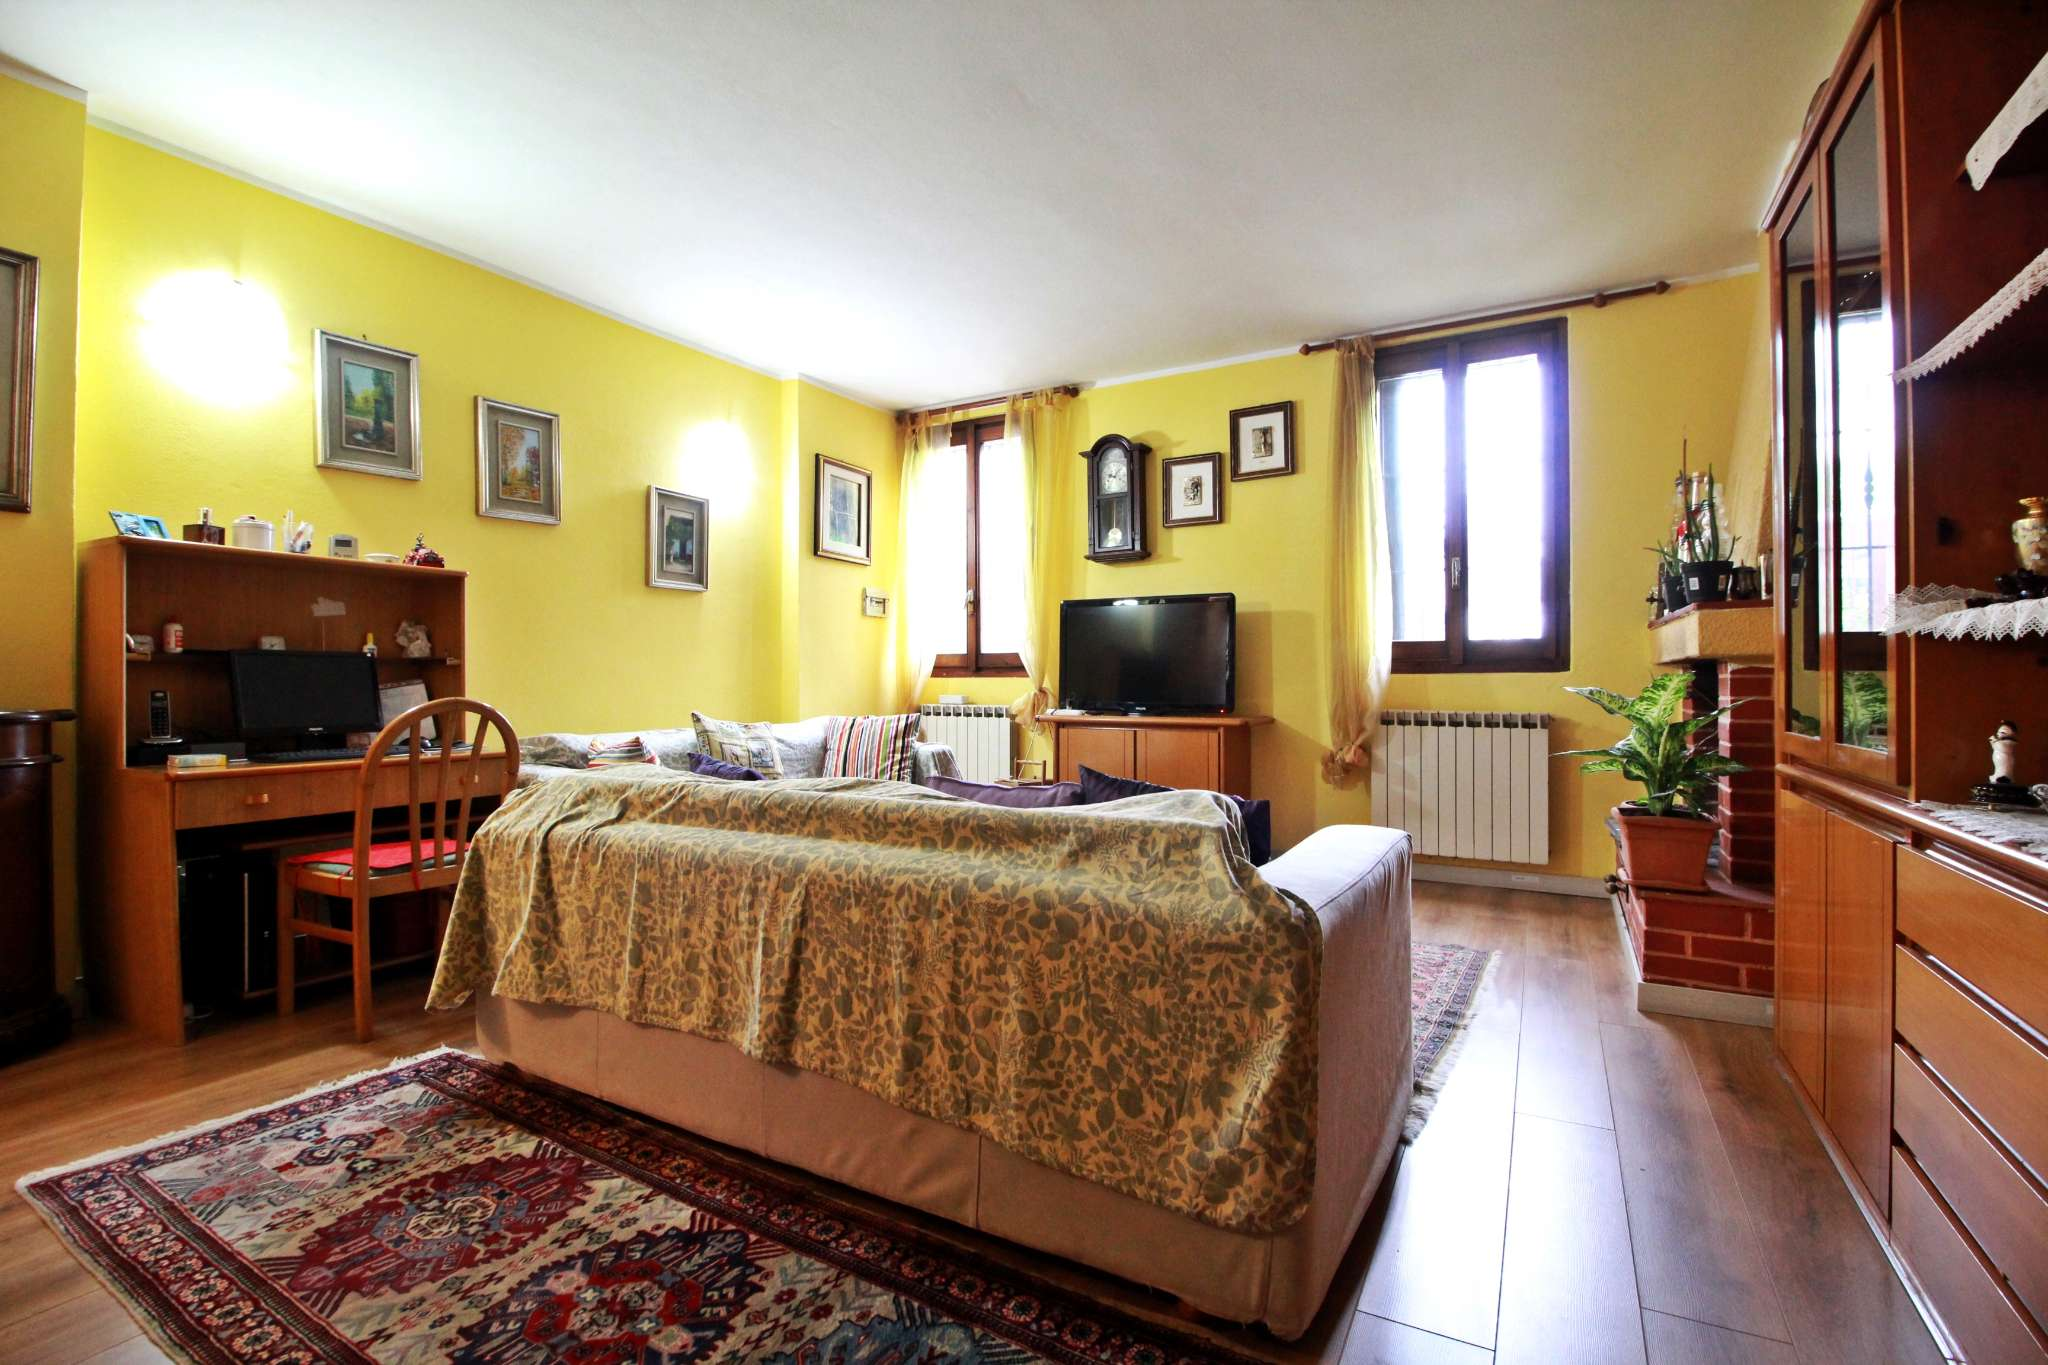 VENDITE Rustici e Case Cavenago di Brianza 8741949